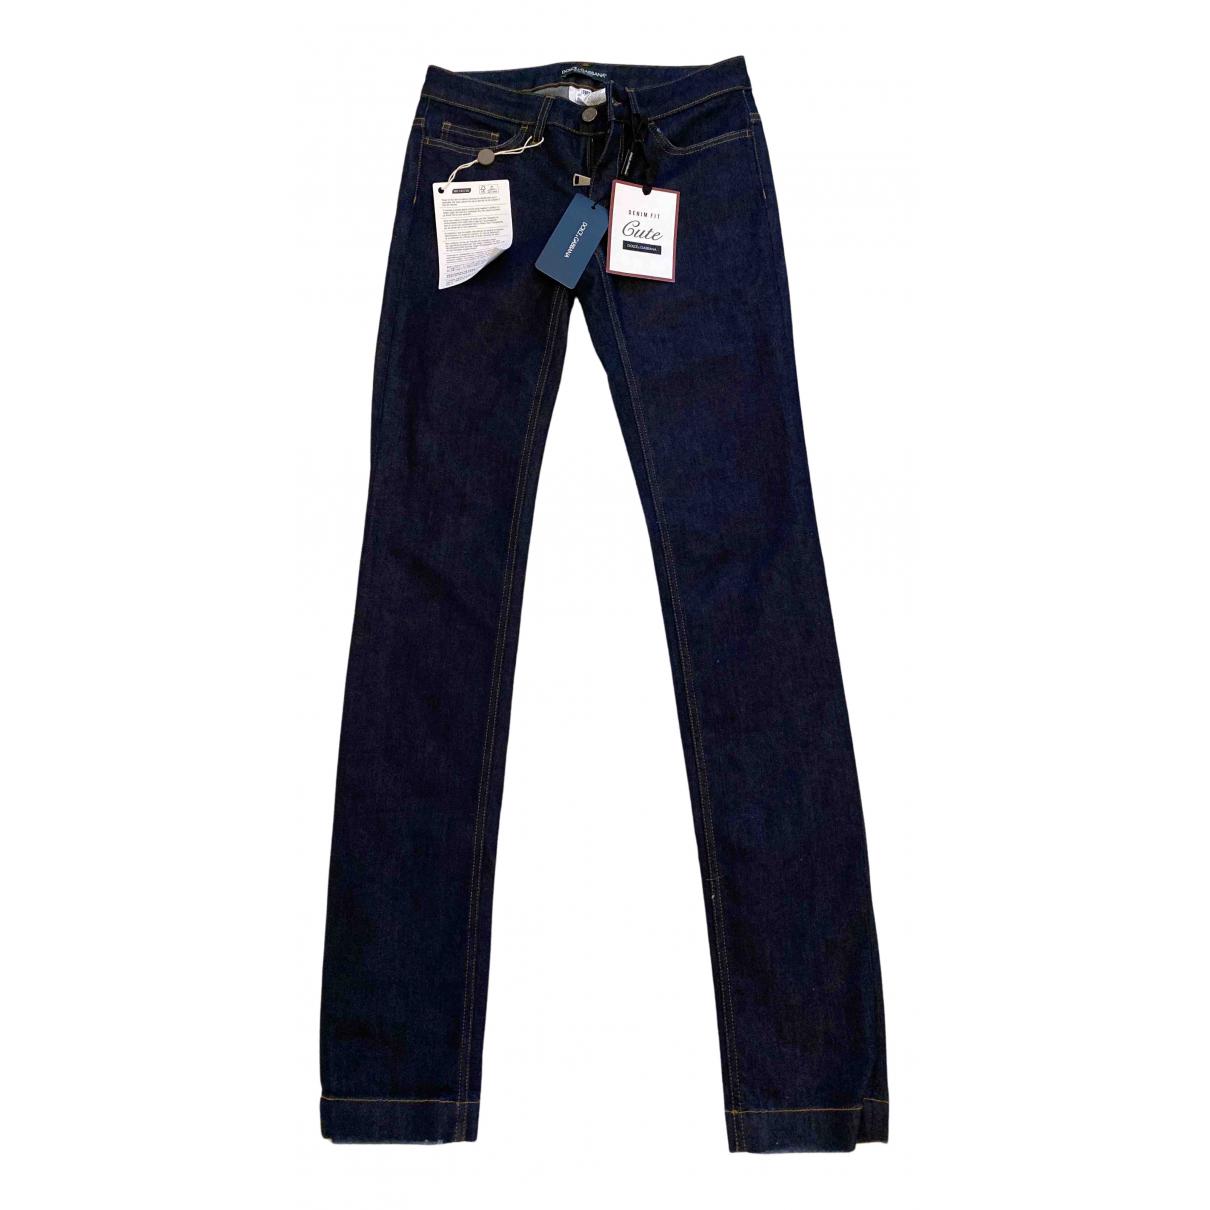 Dolce & Gabbana N Navy Cotton - elasthane Jeans for Women 32 FR